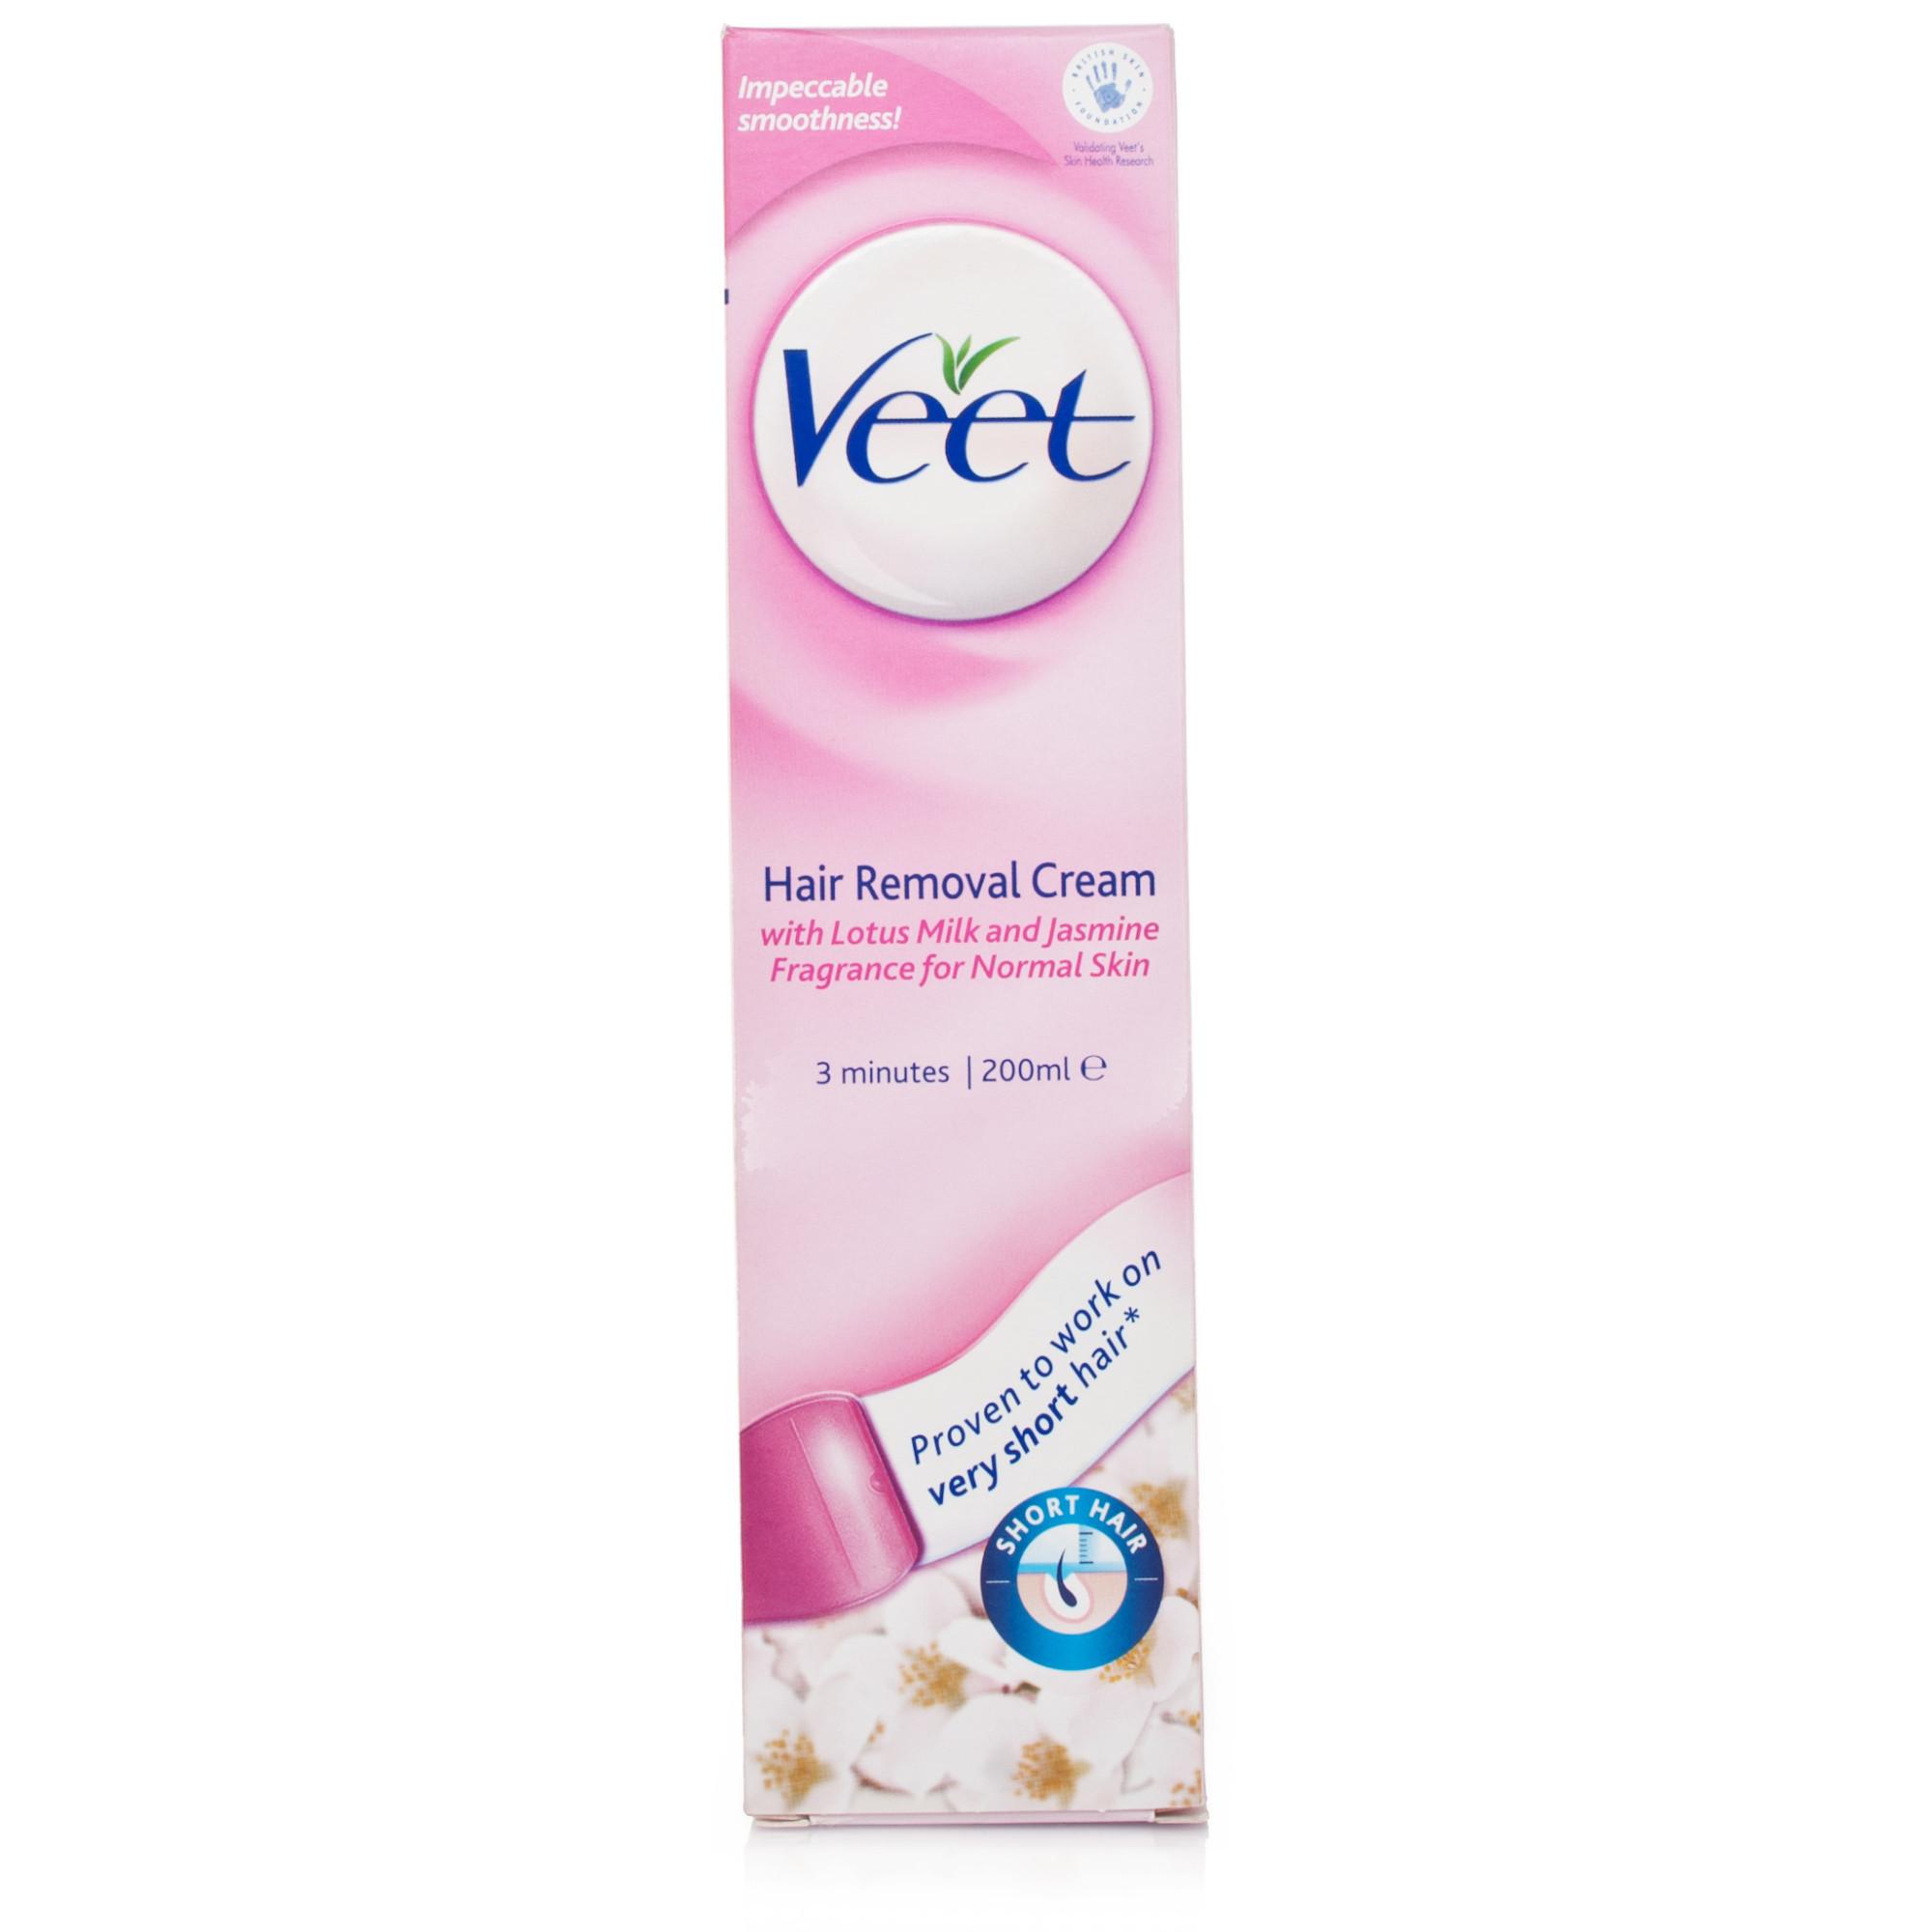 Veet 3 Minute Hair Removal Cream for Normal Skin